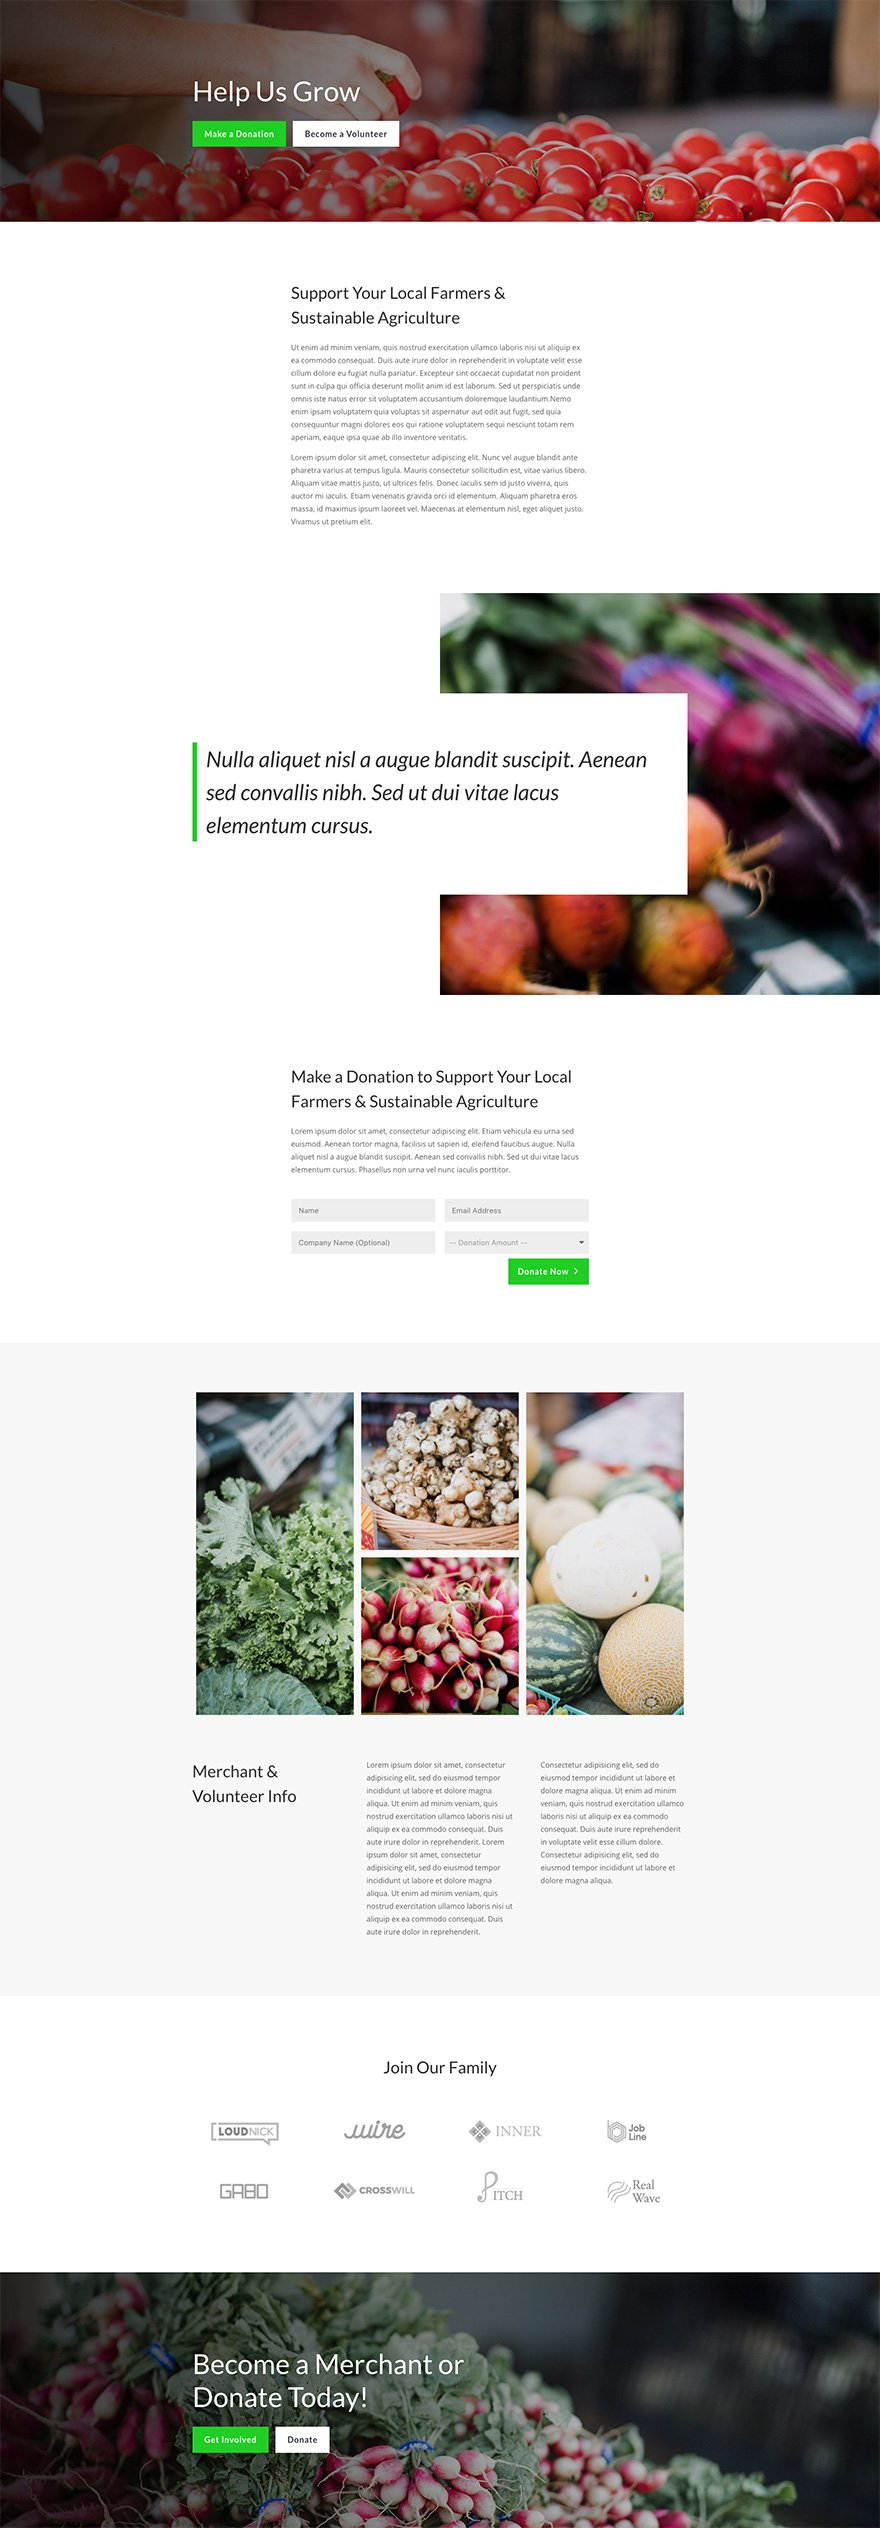 farmers-market-donate